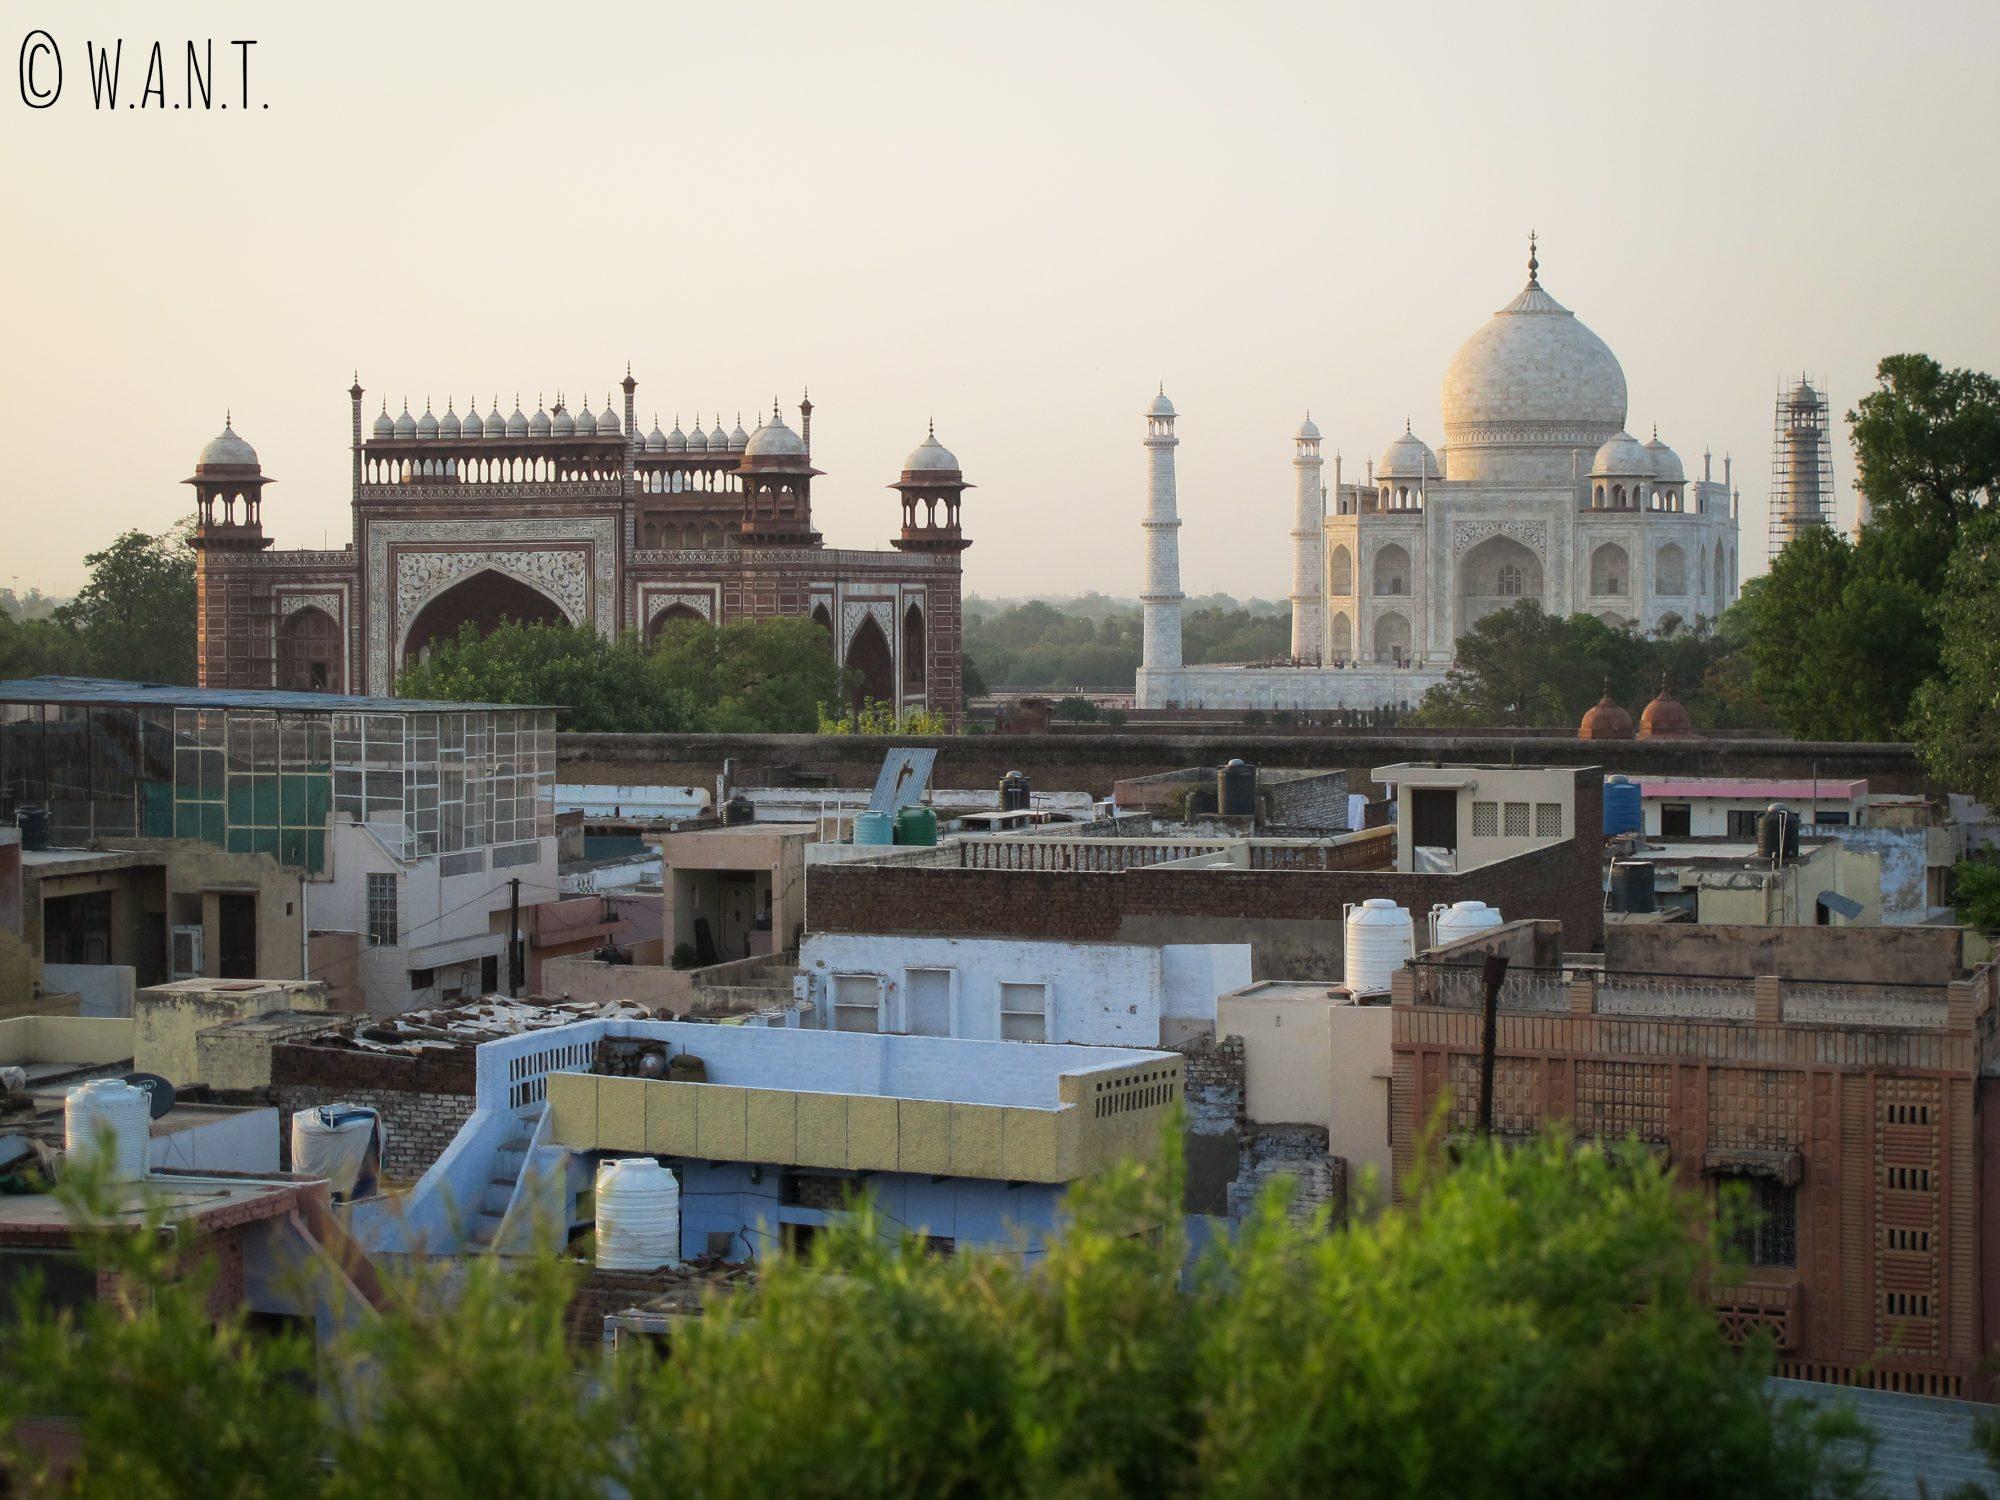 Vue depuis le rooftop du Saniya Palace